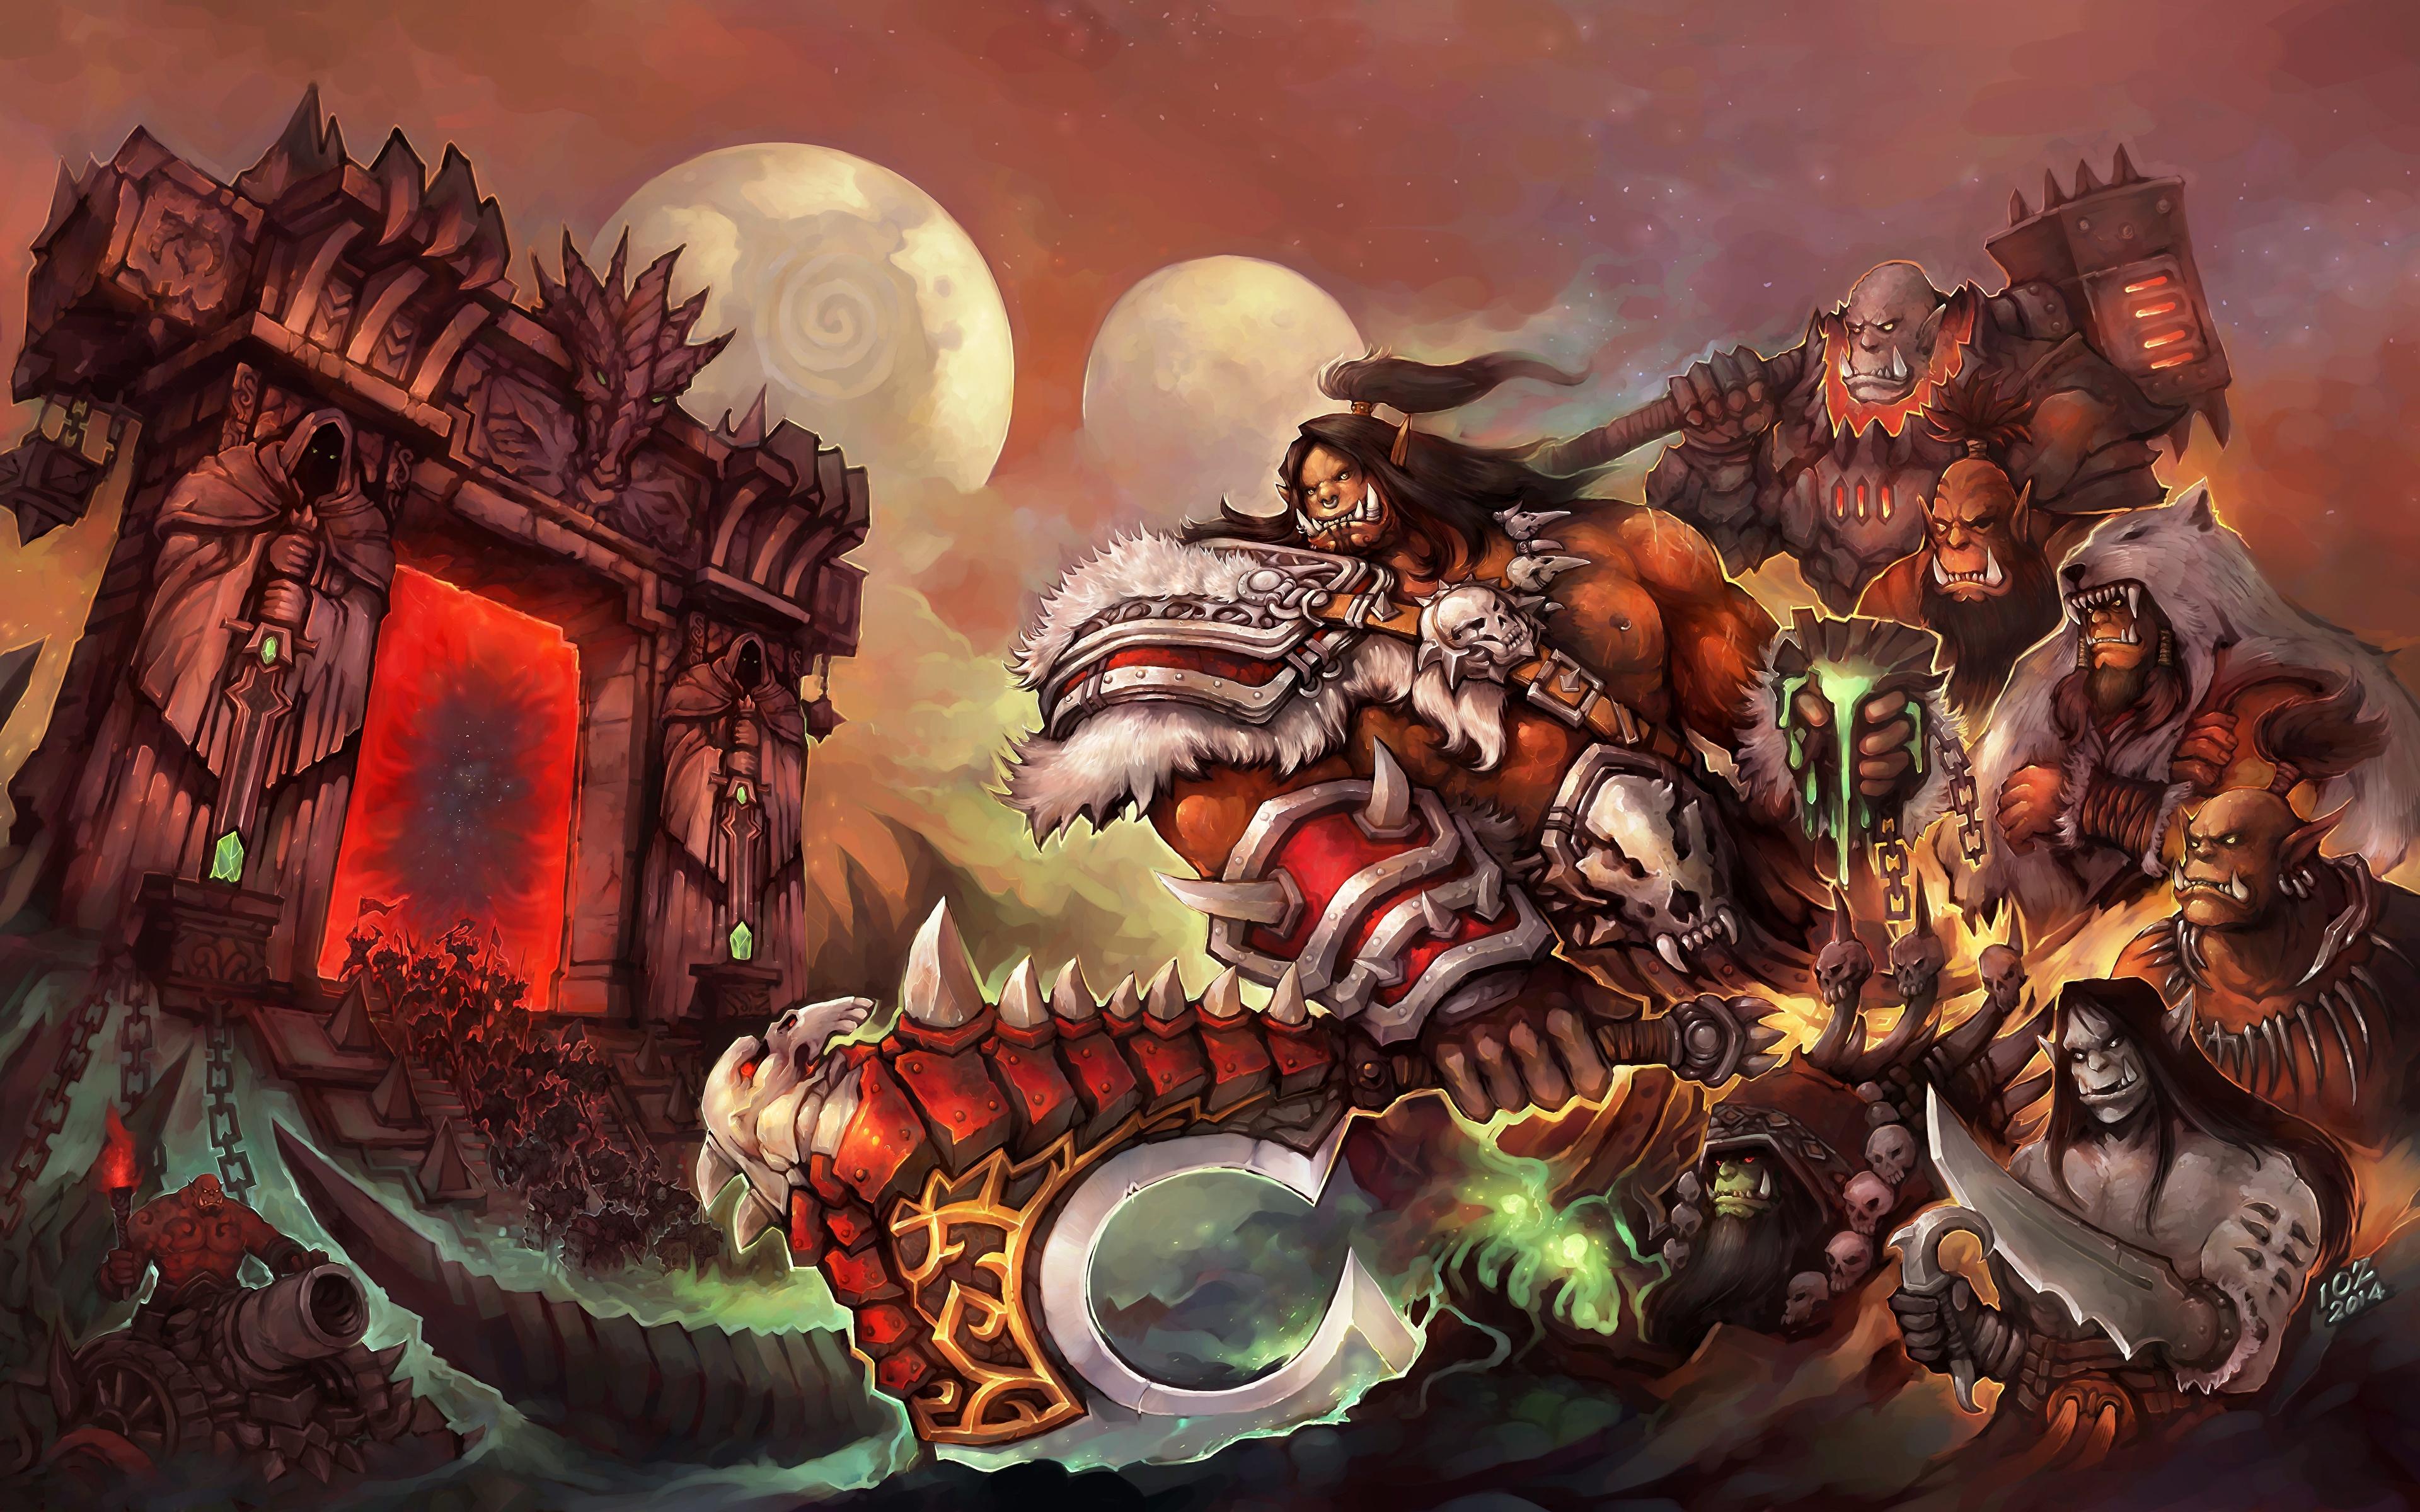 Fondos De Pantalla 3840x2400 World Of Warcraft Orco